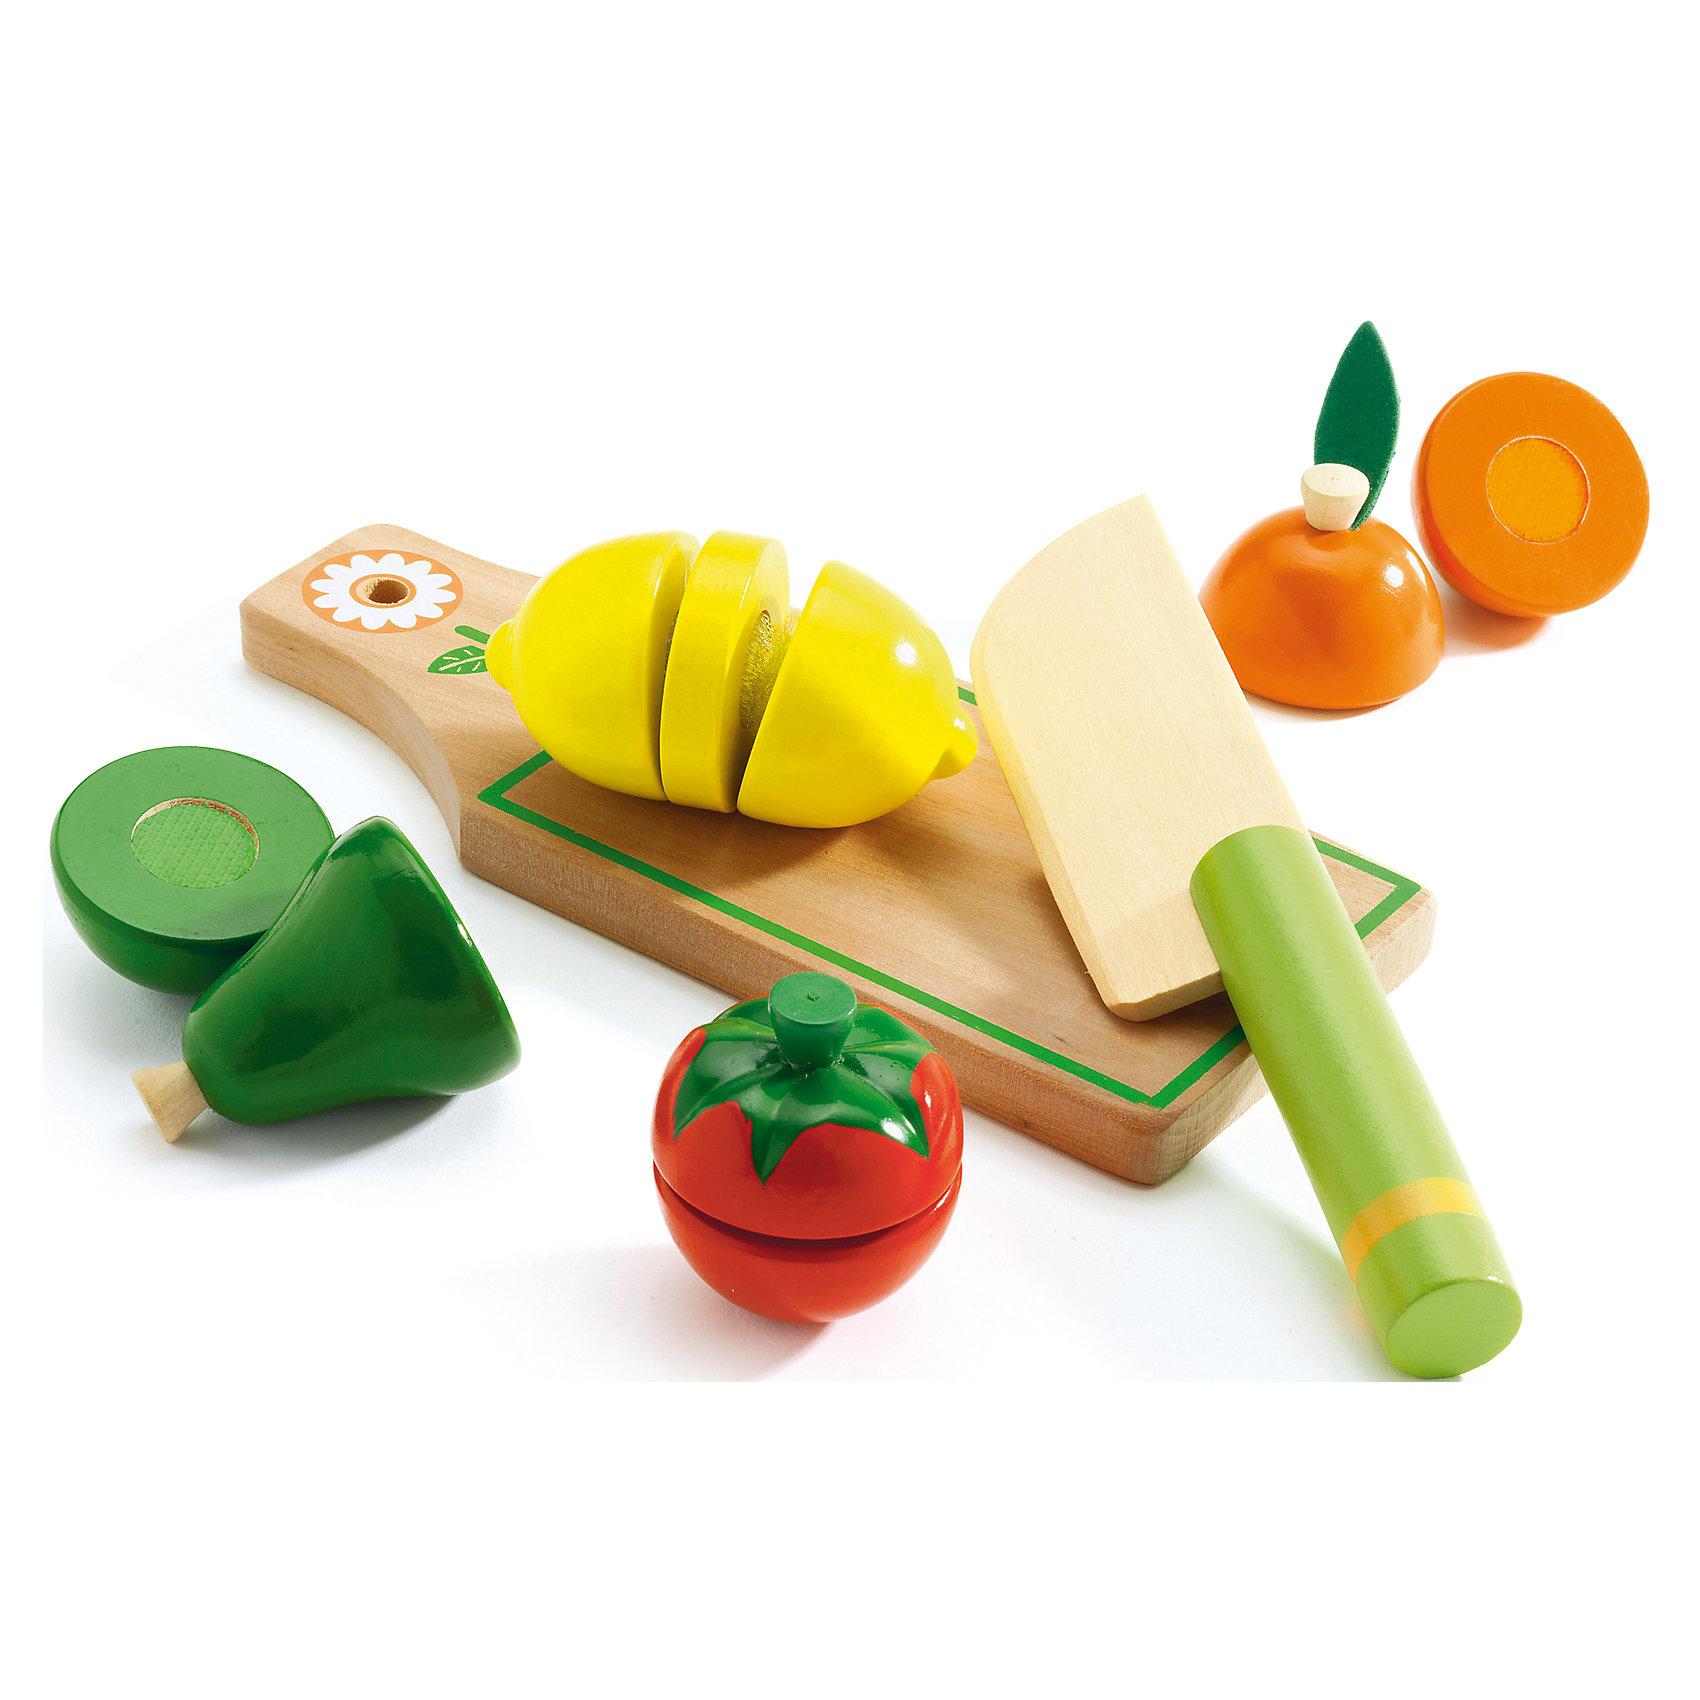 DJECO Набор для разрезания Фрукты и овощи, DJECO djeco набор игрушек животные djeco